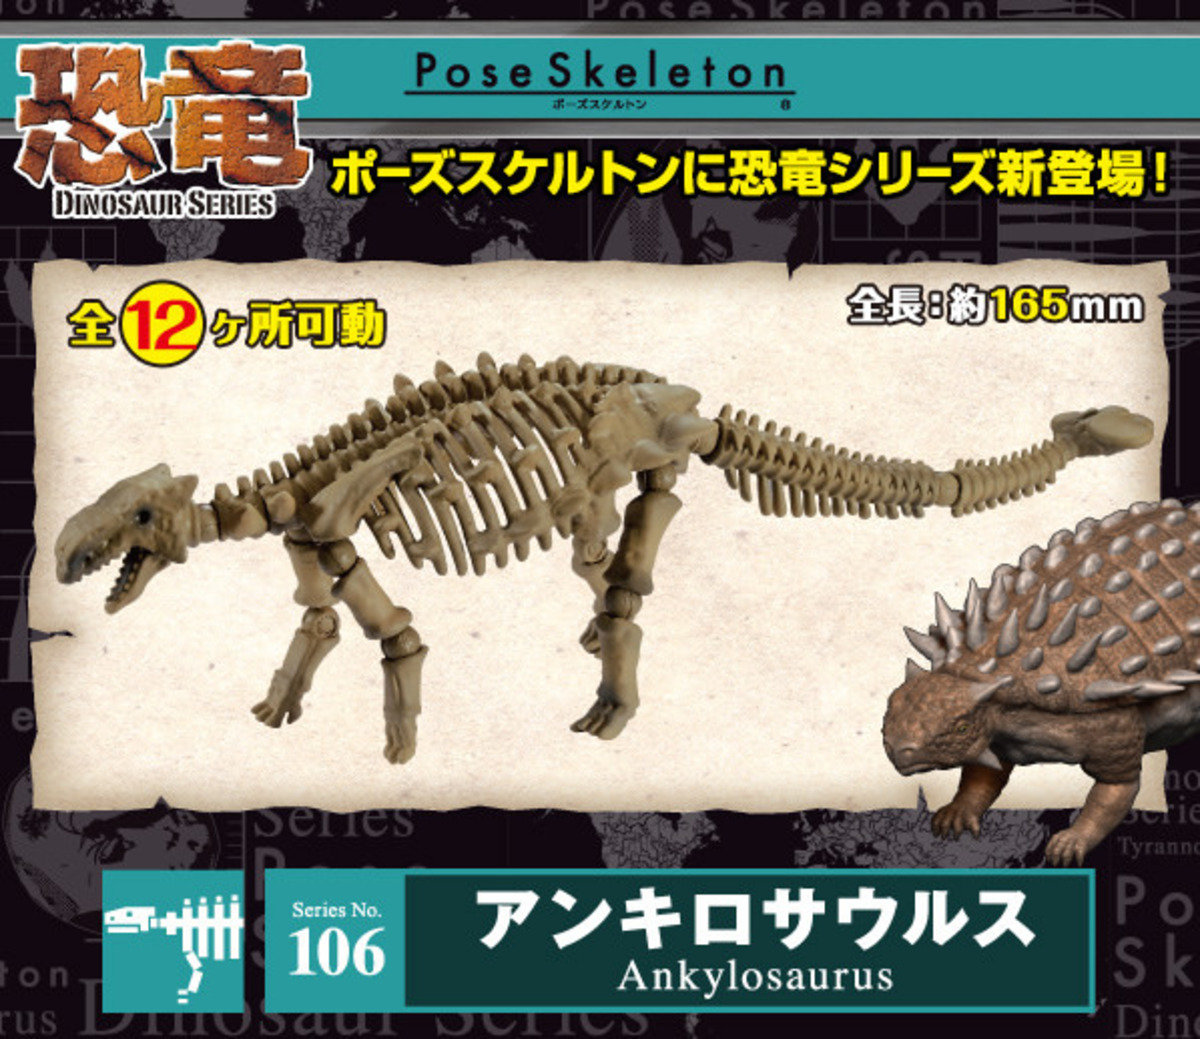 Re-ment Pose Skeleton 恐龍no.106 甲龍